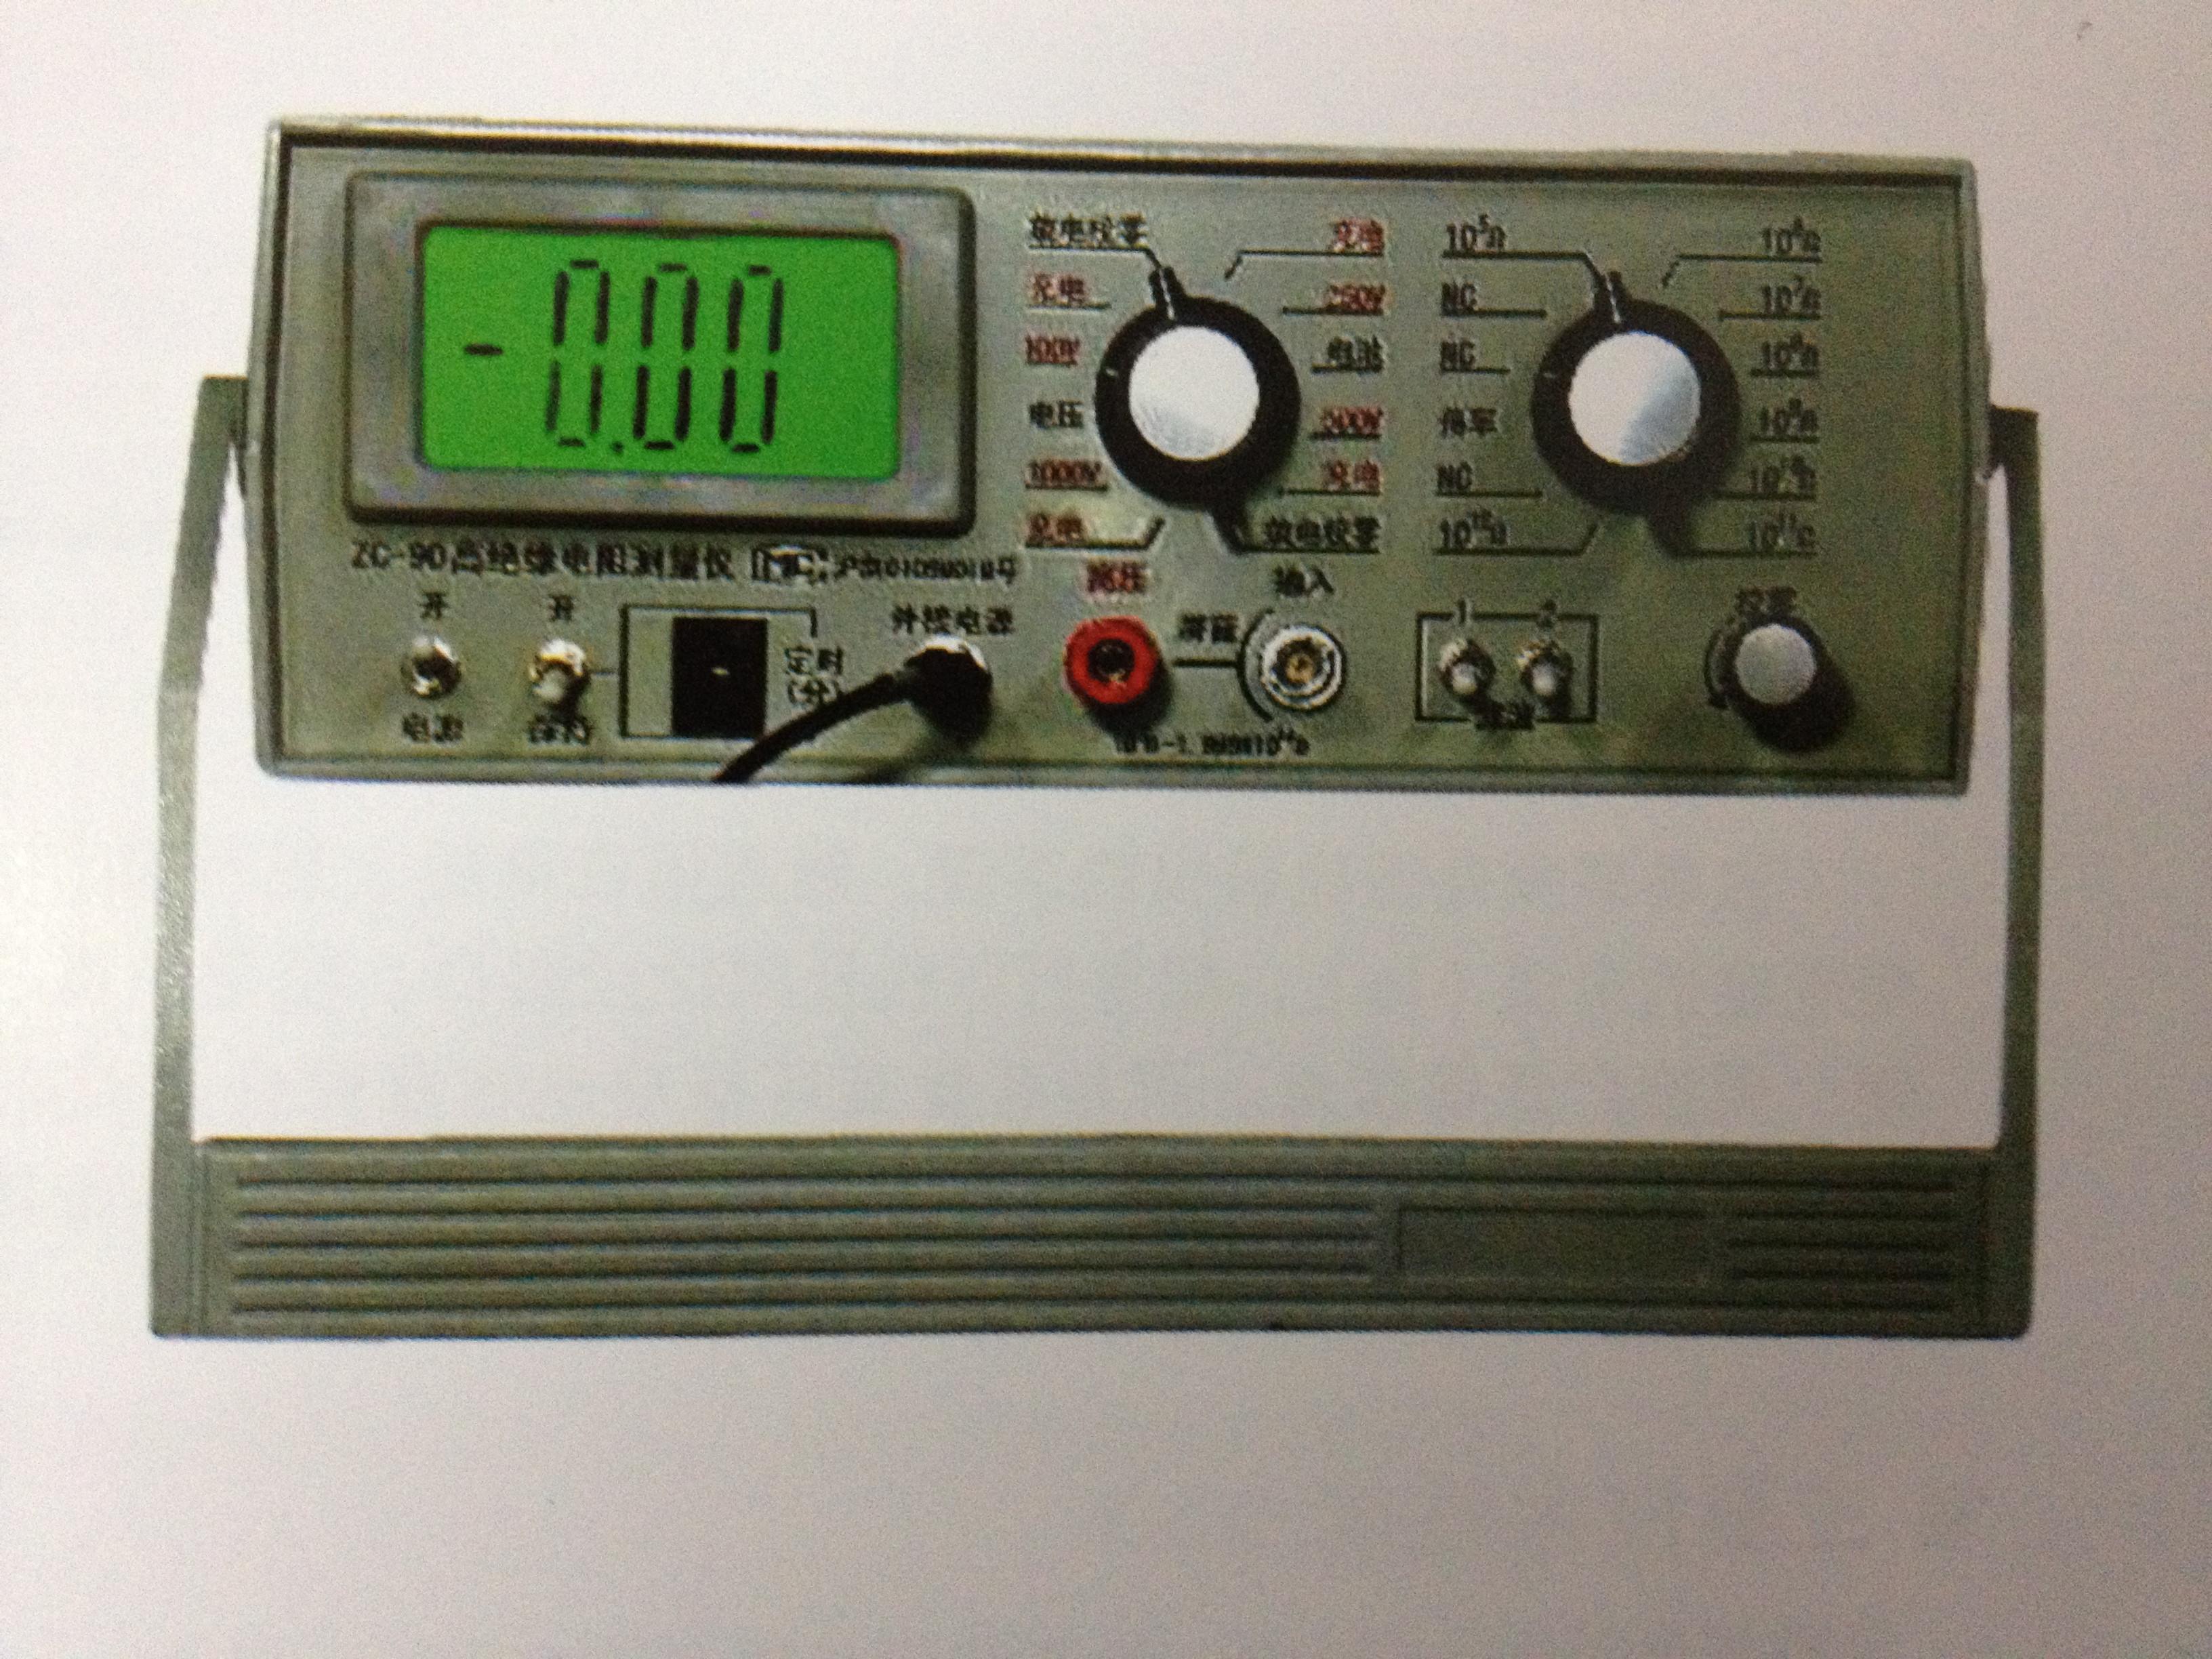 ZC-90型绝缘电阻测试仪 特点与用途:ZC-90系列绝缘电阻测试仪是测试电工绝缘材料、电线电缆、防 静电工程电阻测量以及其他电工制品绝缘电阻的理想仪器。本仪器采用了国际 上最先进的超高阻、微电流器件,具有测量精度高,分辨率强,抗干扰能力强、 读数稳定性好,体积小携带、使用方便,电池通用性强的优点。 ZC-90 系列 绝缘电阻测试仪历年来被上海电缆研究所认证处推荐为生产许可必备仪器之一。 技术参数: 1、测试电压: 100V、250V、500V、1000V 2、电压精度:± 3% 3、测量范